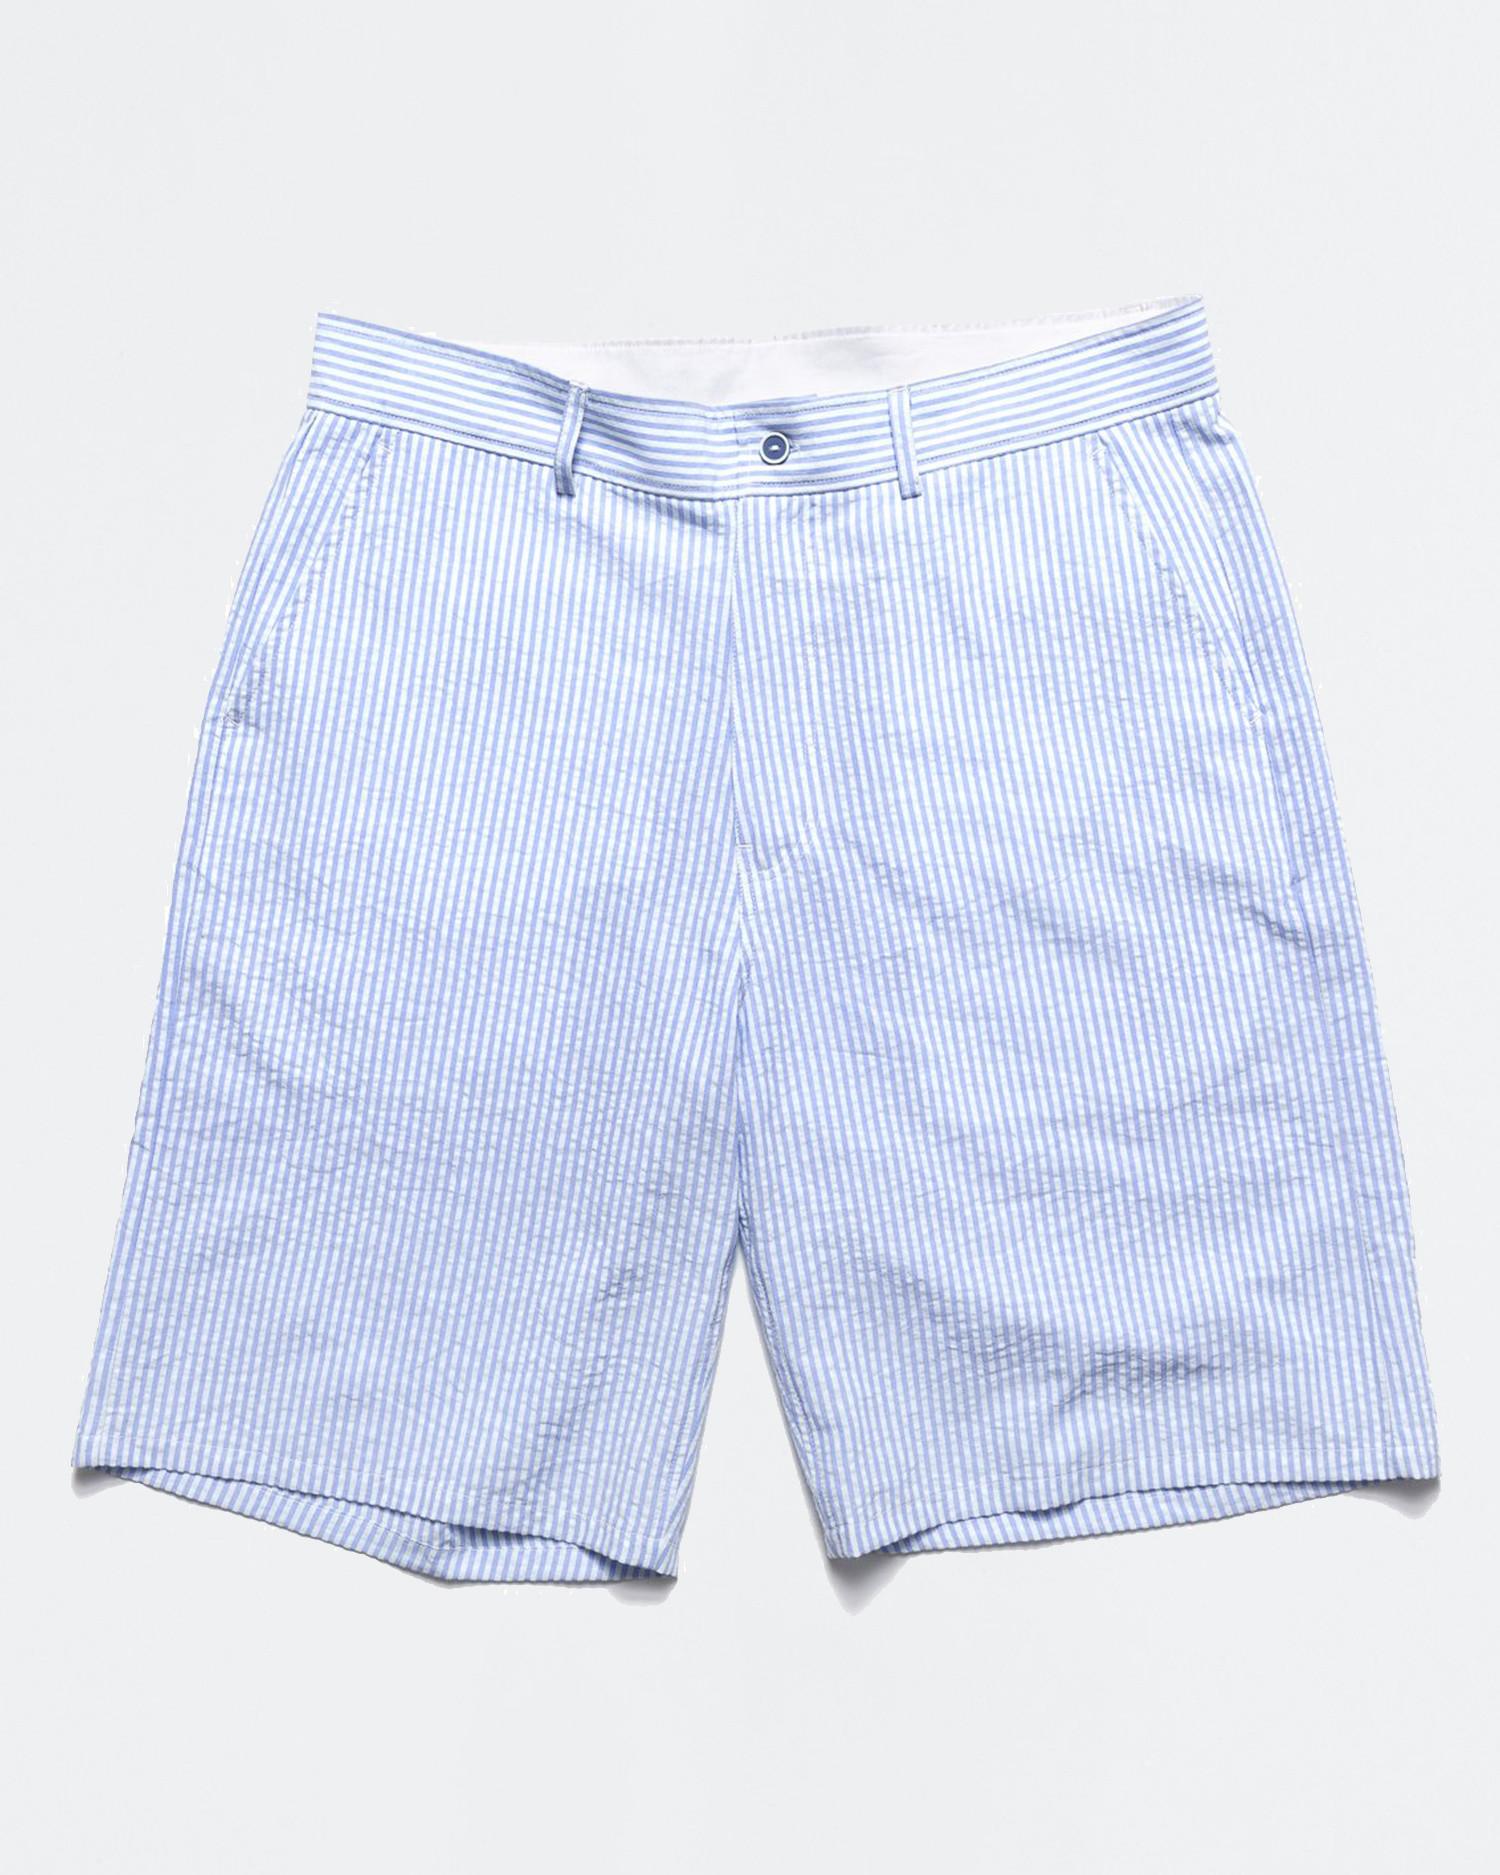 Chrystie NYC OG Logo Seersucker Short Pant Blue Stripes